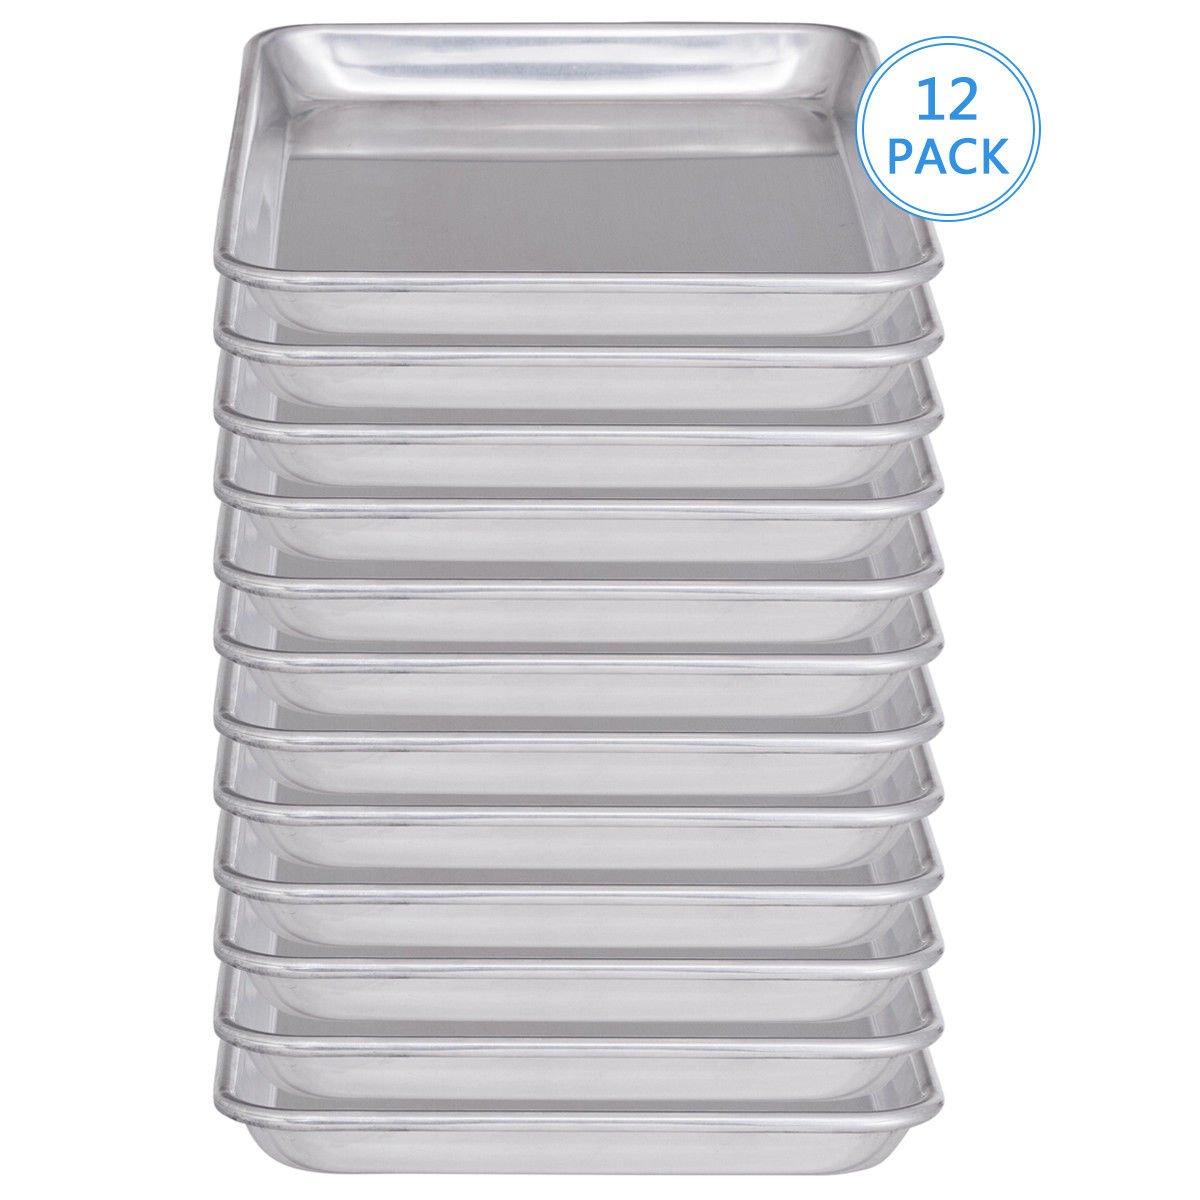 chefjoy 12 Piece Aluminum半分シートパンCommercial BakingトレイノンスティックBakeware B078NXPC66